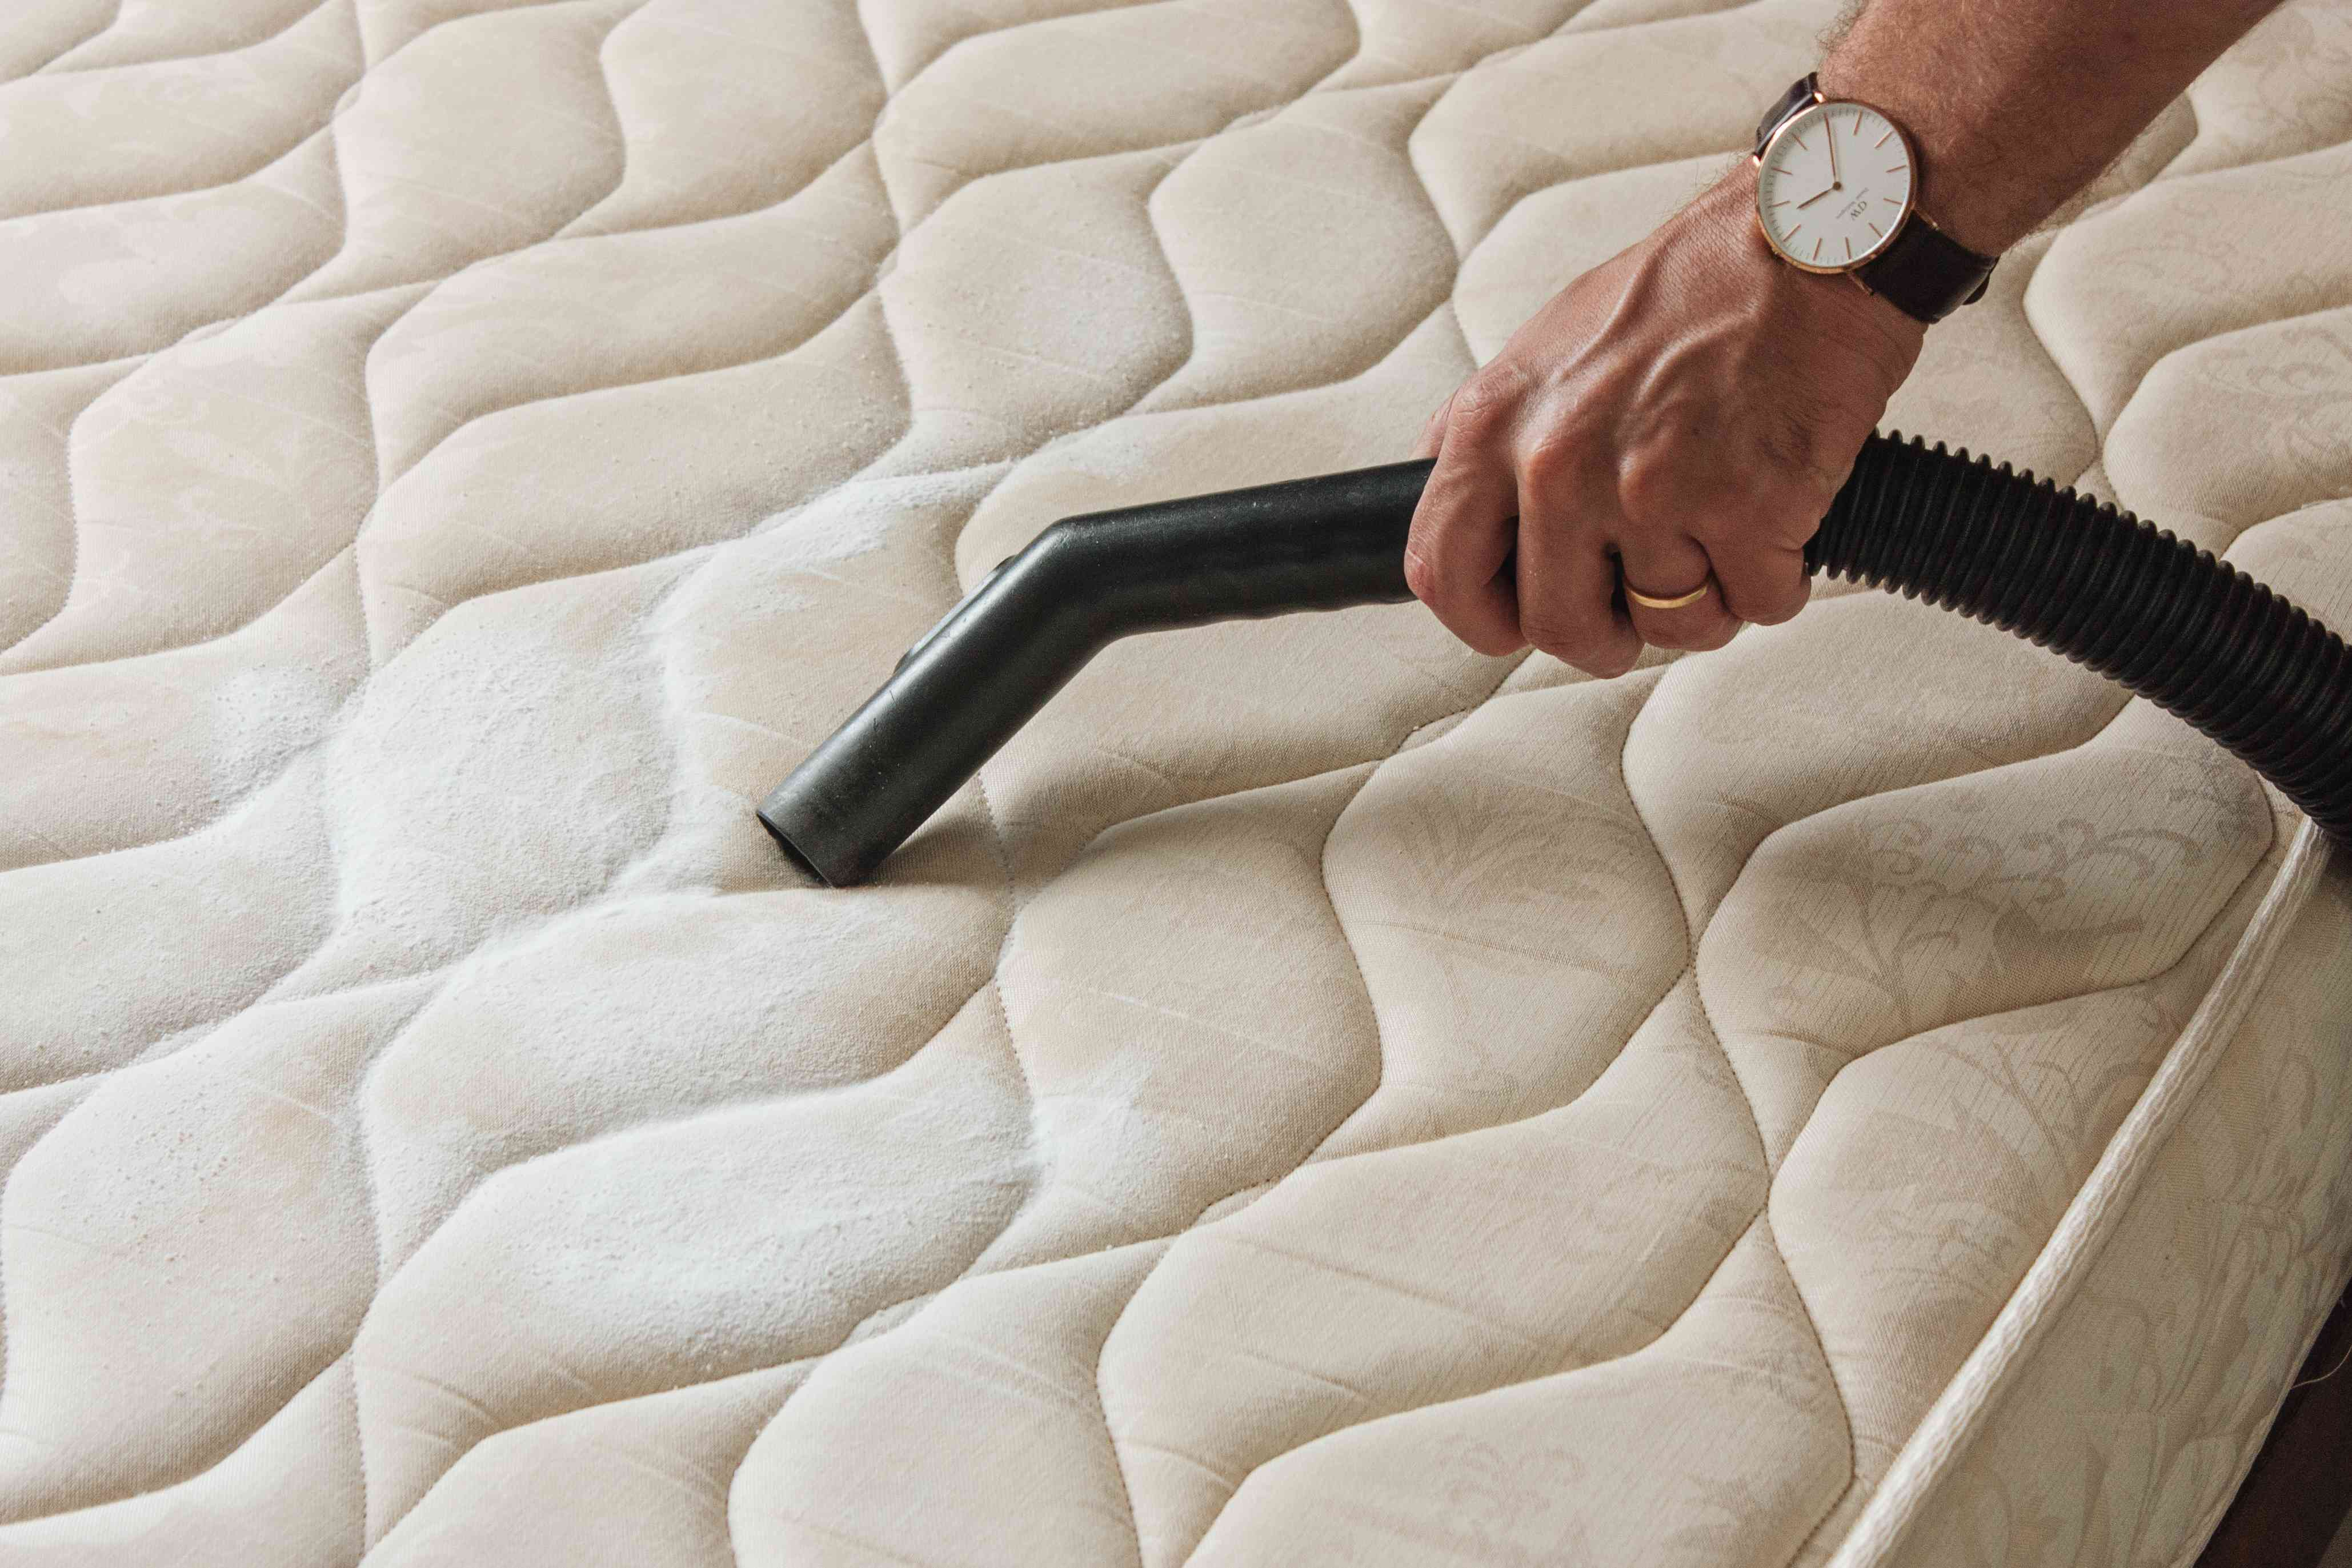 person vacuuming baking soda off of a mattress